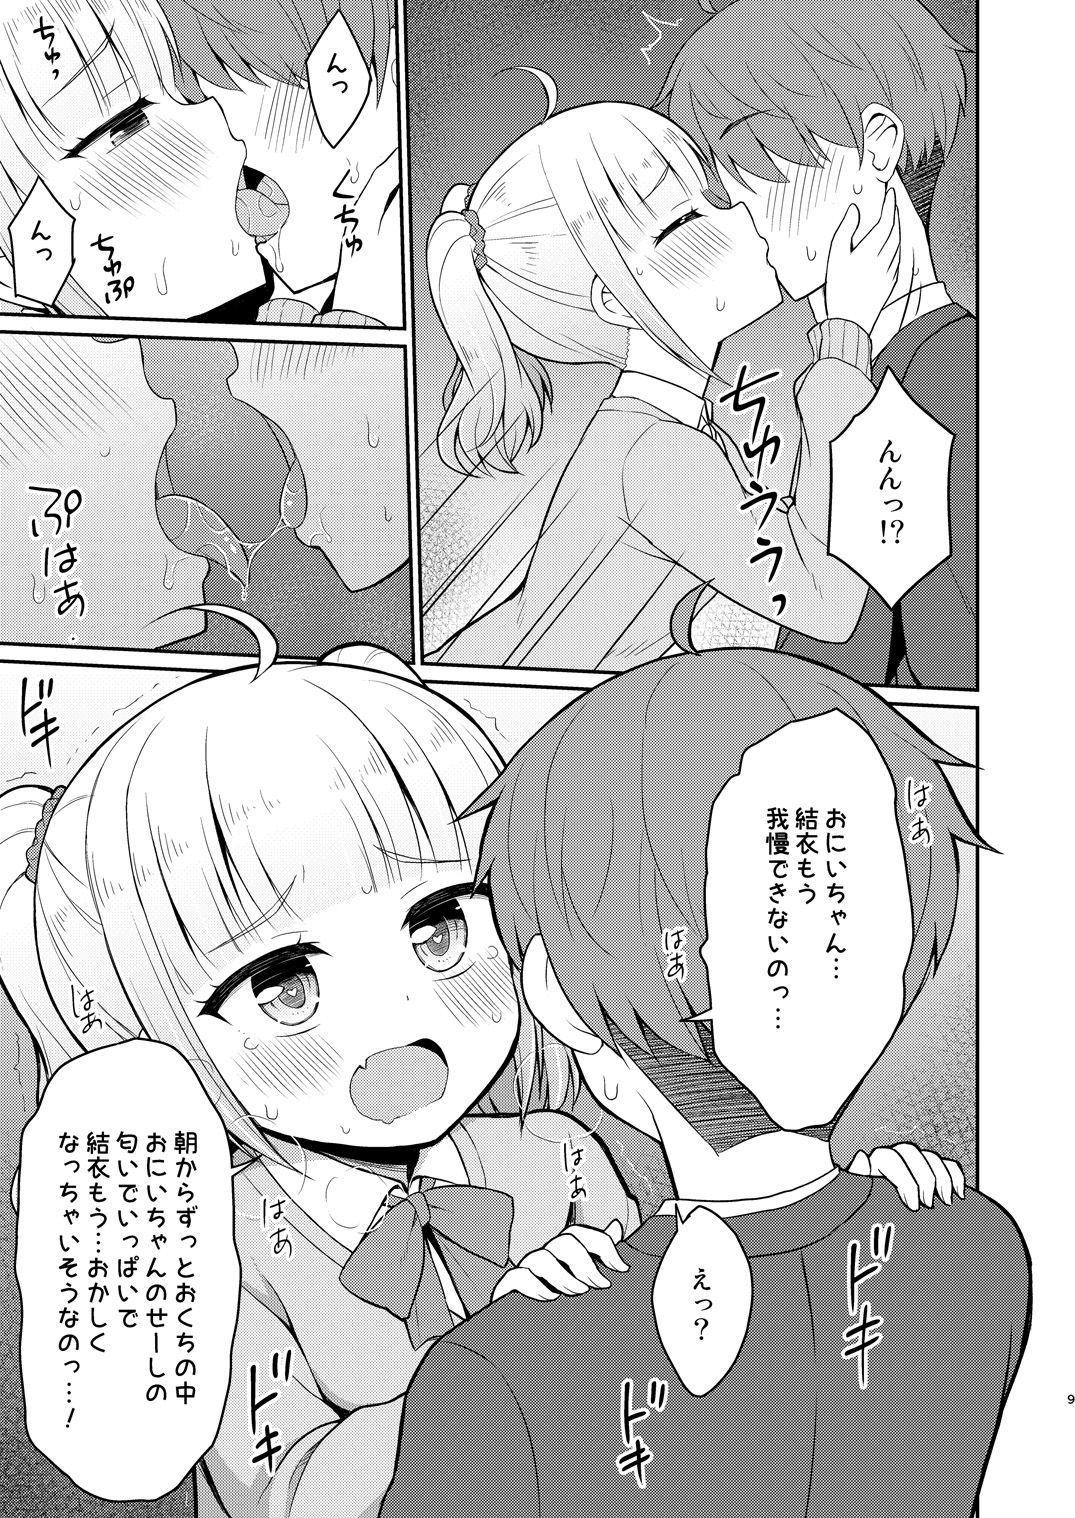 Onii-chan Daisuki H Shiyo 2 8